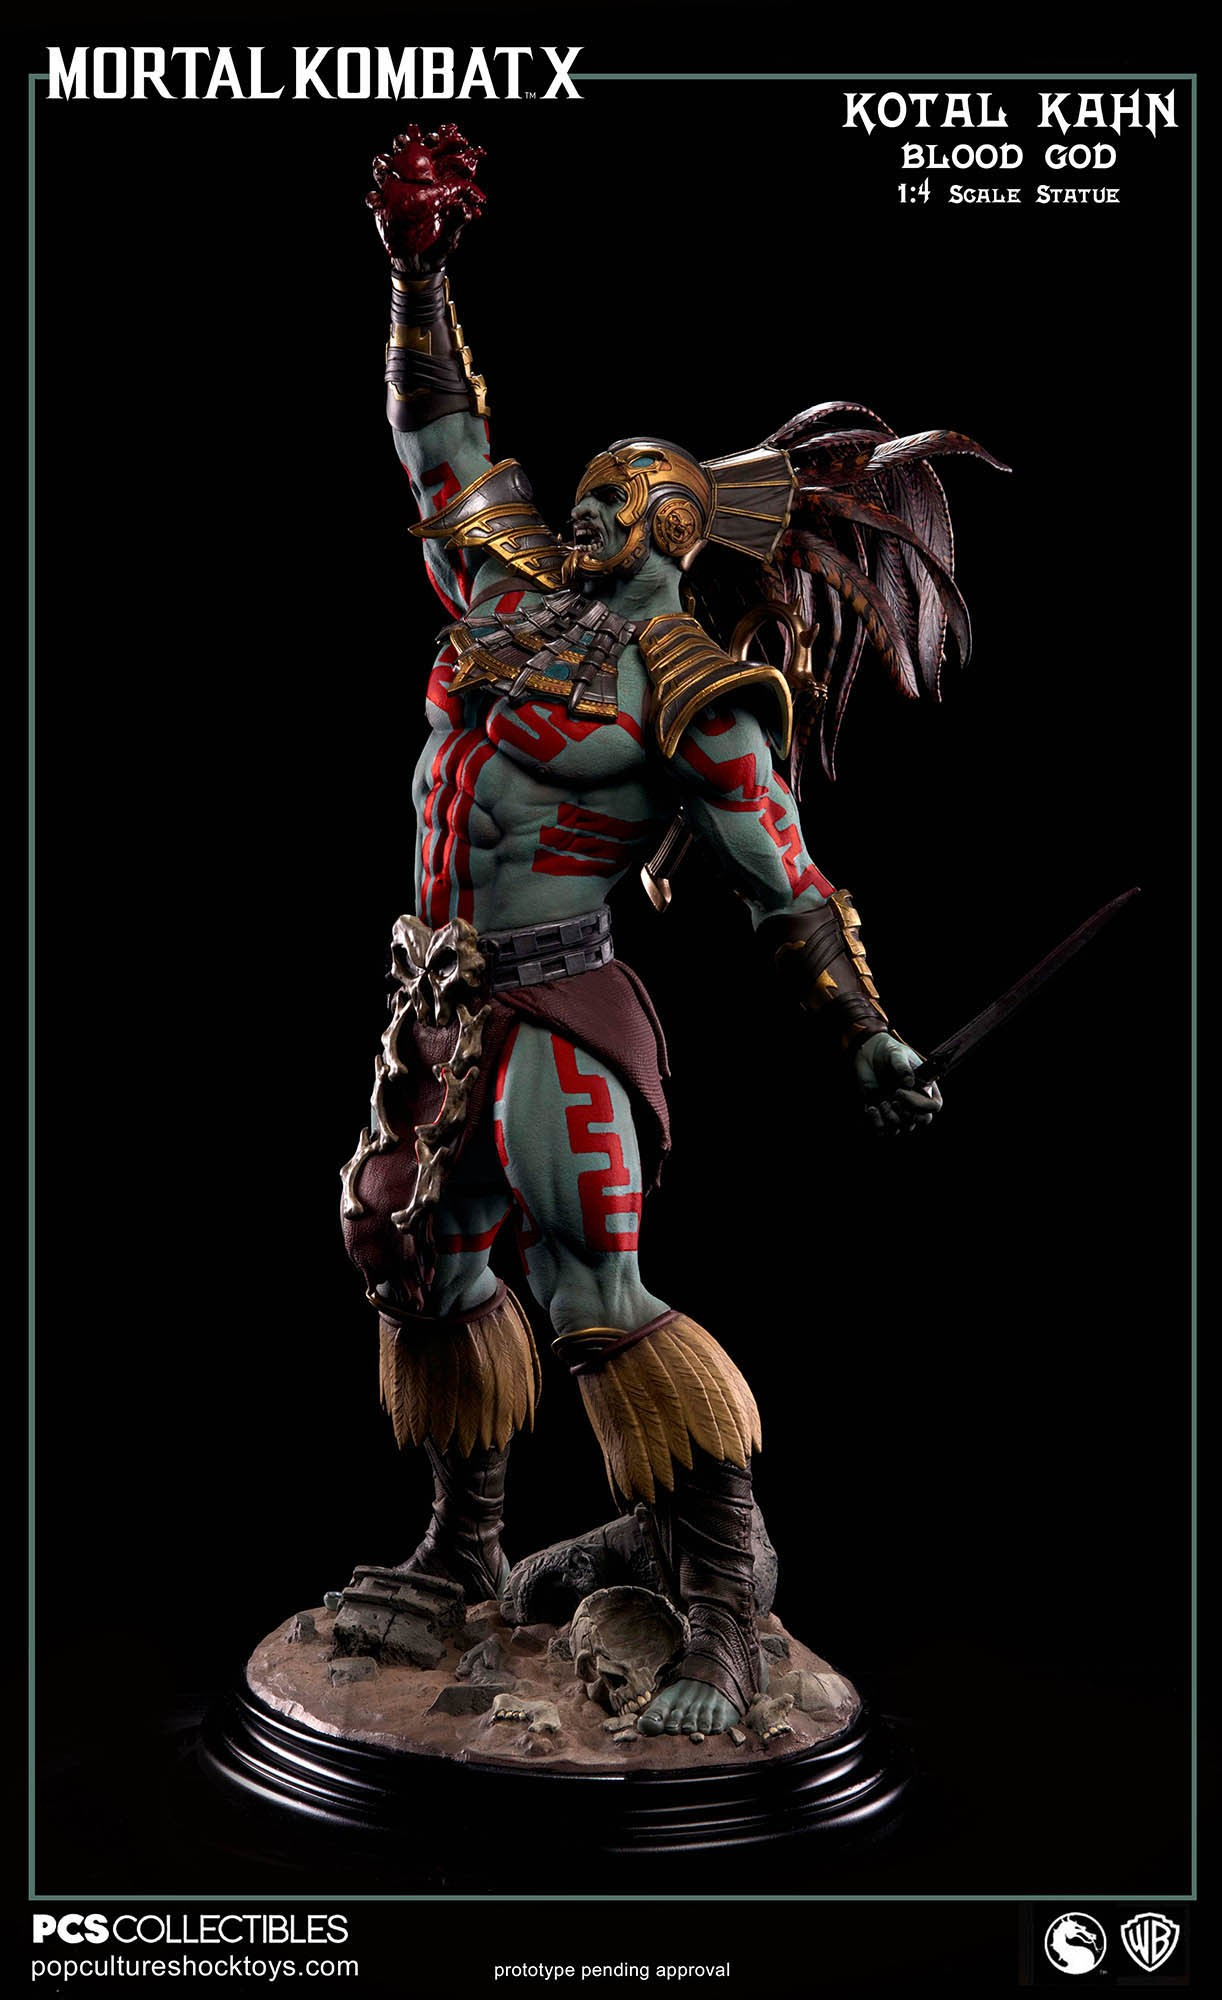 [Pop Culture Shock] Mortal Kombat X: Kotal Kahn 1:4 scale PCS-Kotal-Kahn-Blood-God-005